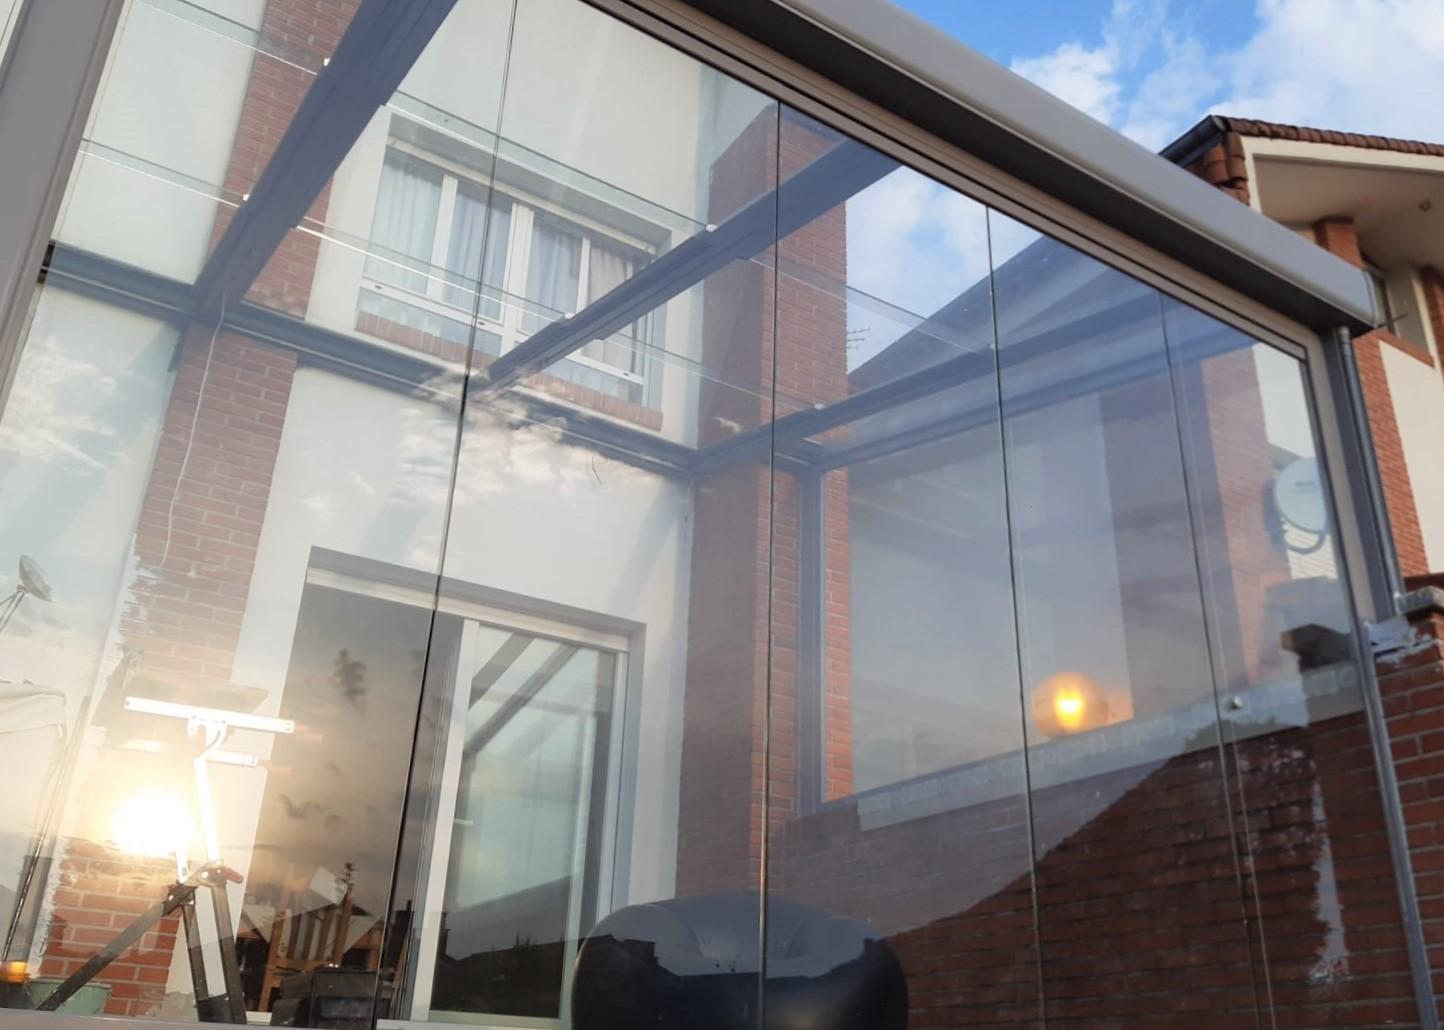 Instalación techo móvil de cristal. Guipúzcoa